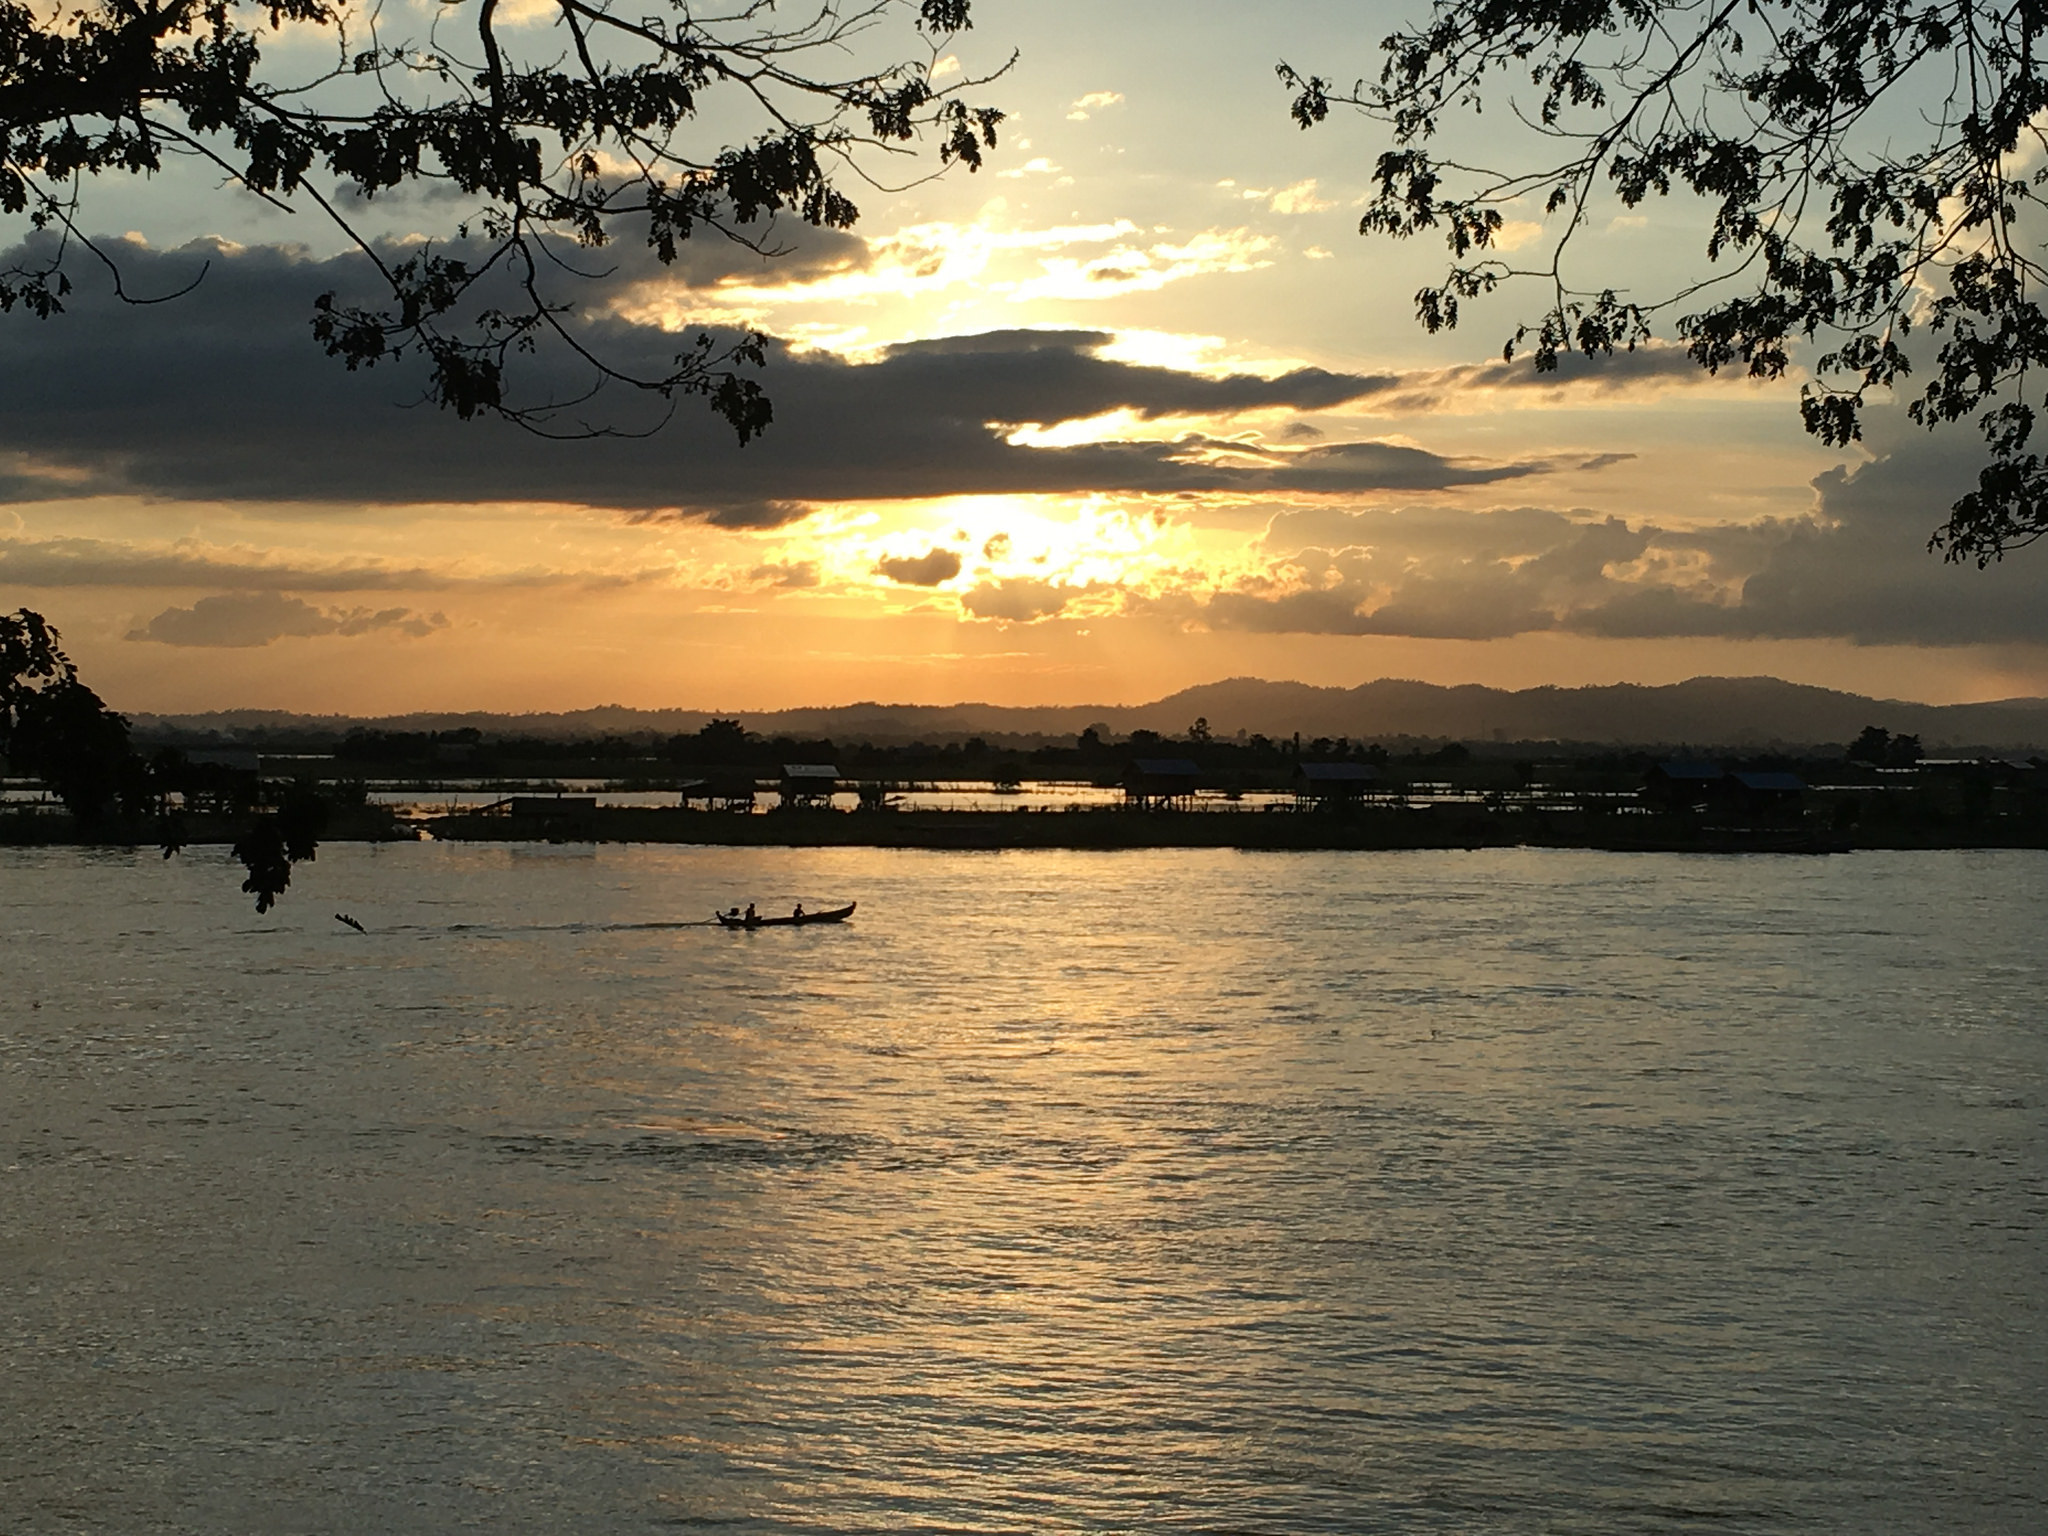 Sunset on the Ayeyarwady River Myanmar